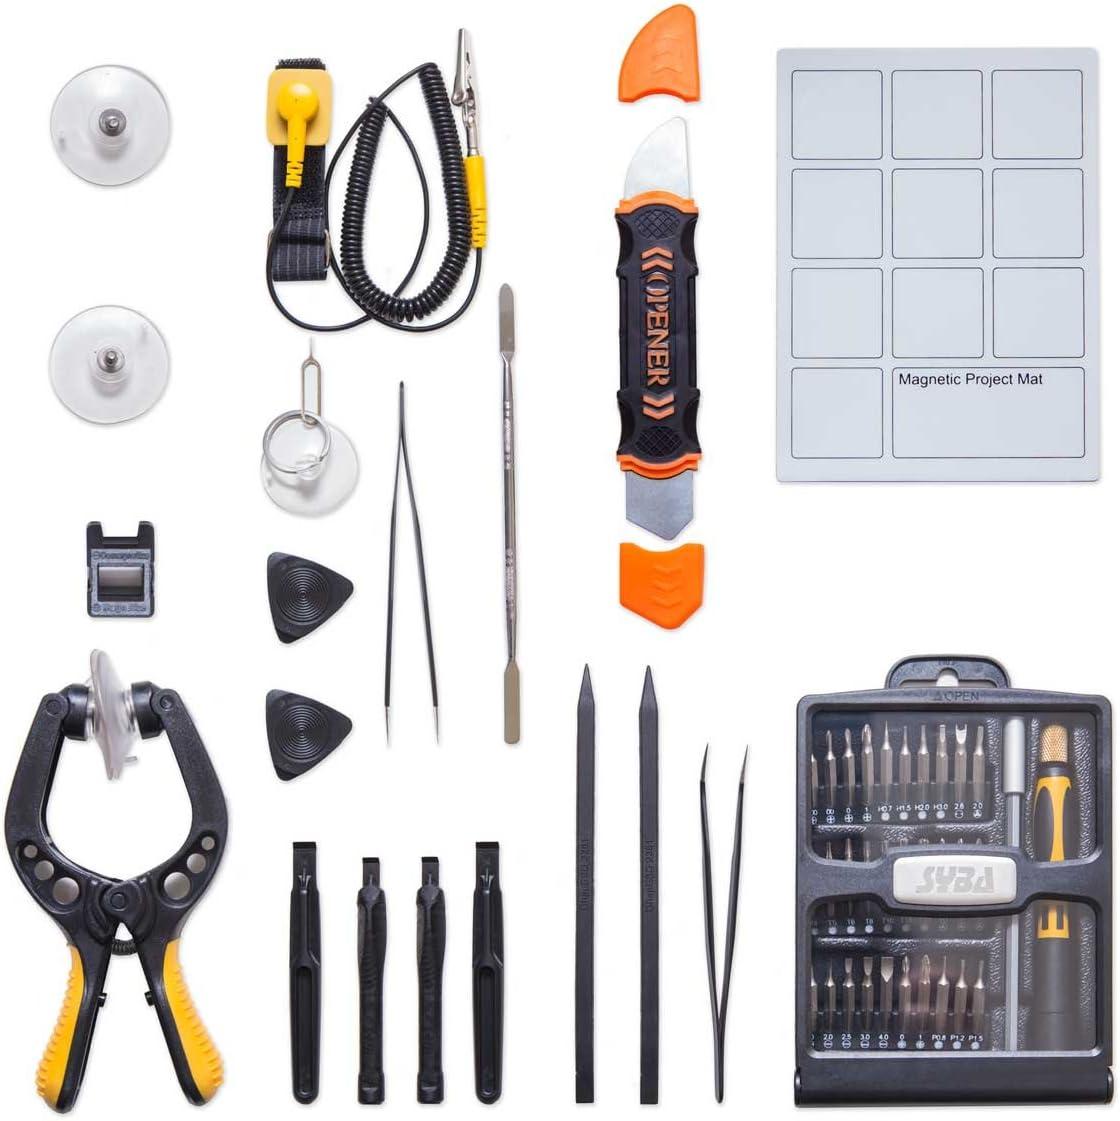 Syba 新品未使用正規品 Precision Screwdriver Set with 高価値 Magnetic Kit Driver Profess